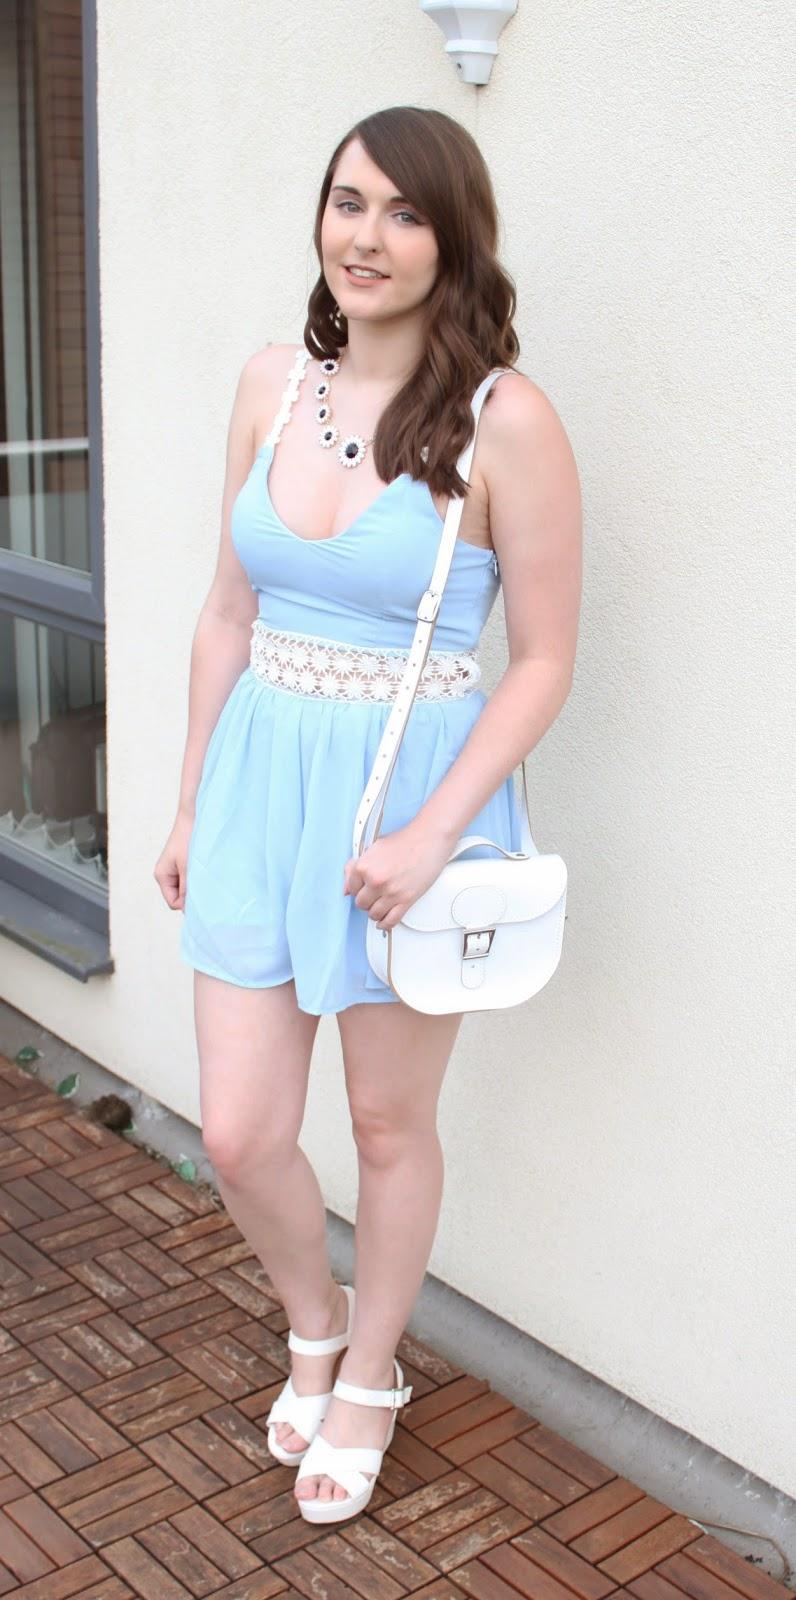 54303c83435 Missguided Blue Pastel Dress - £29.99 / Newlook Daisy necklace - £7.99 /  Britstitch White Half Pint Bag - £35 (in flash sale!) / Primark White  Wedges - £10